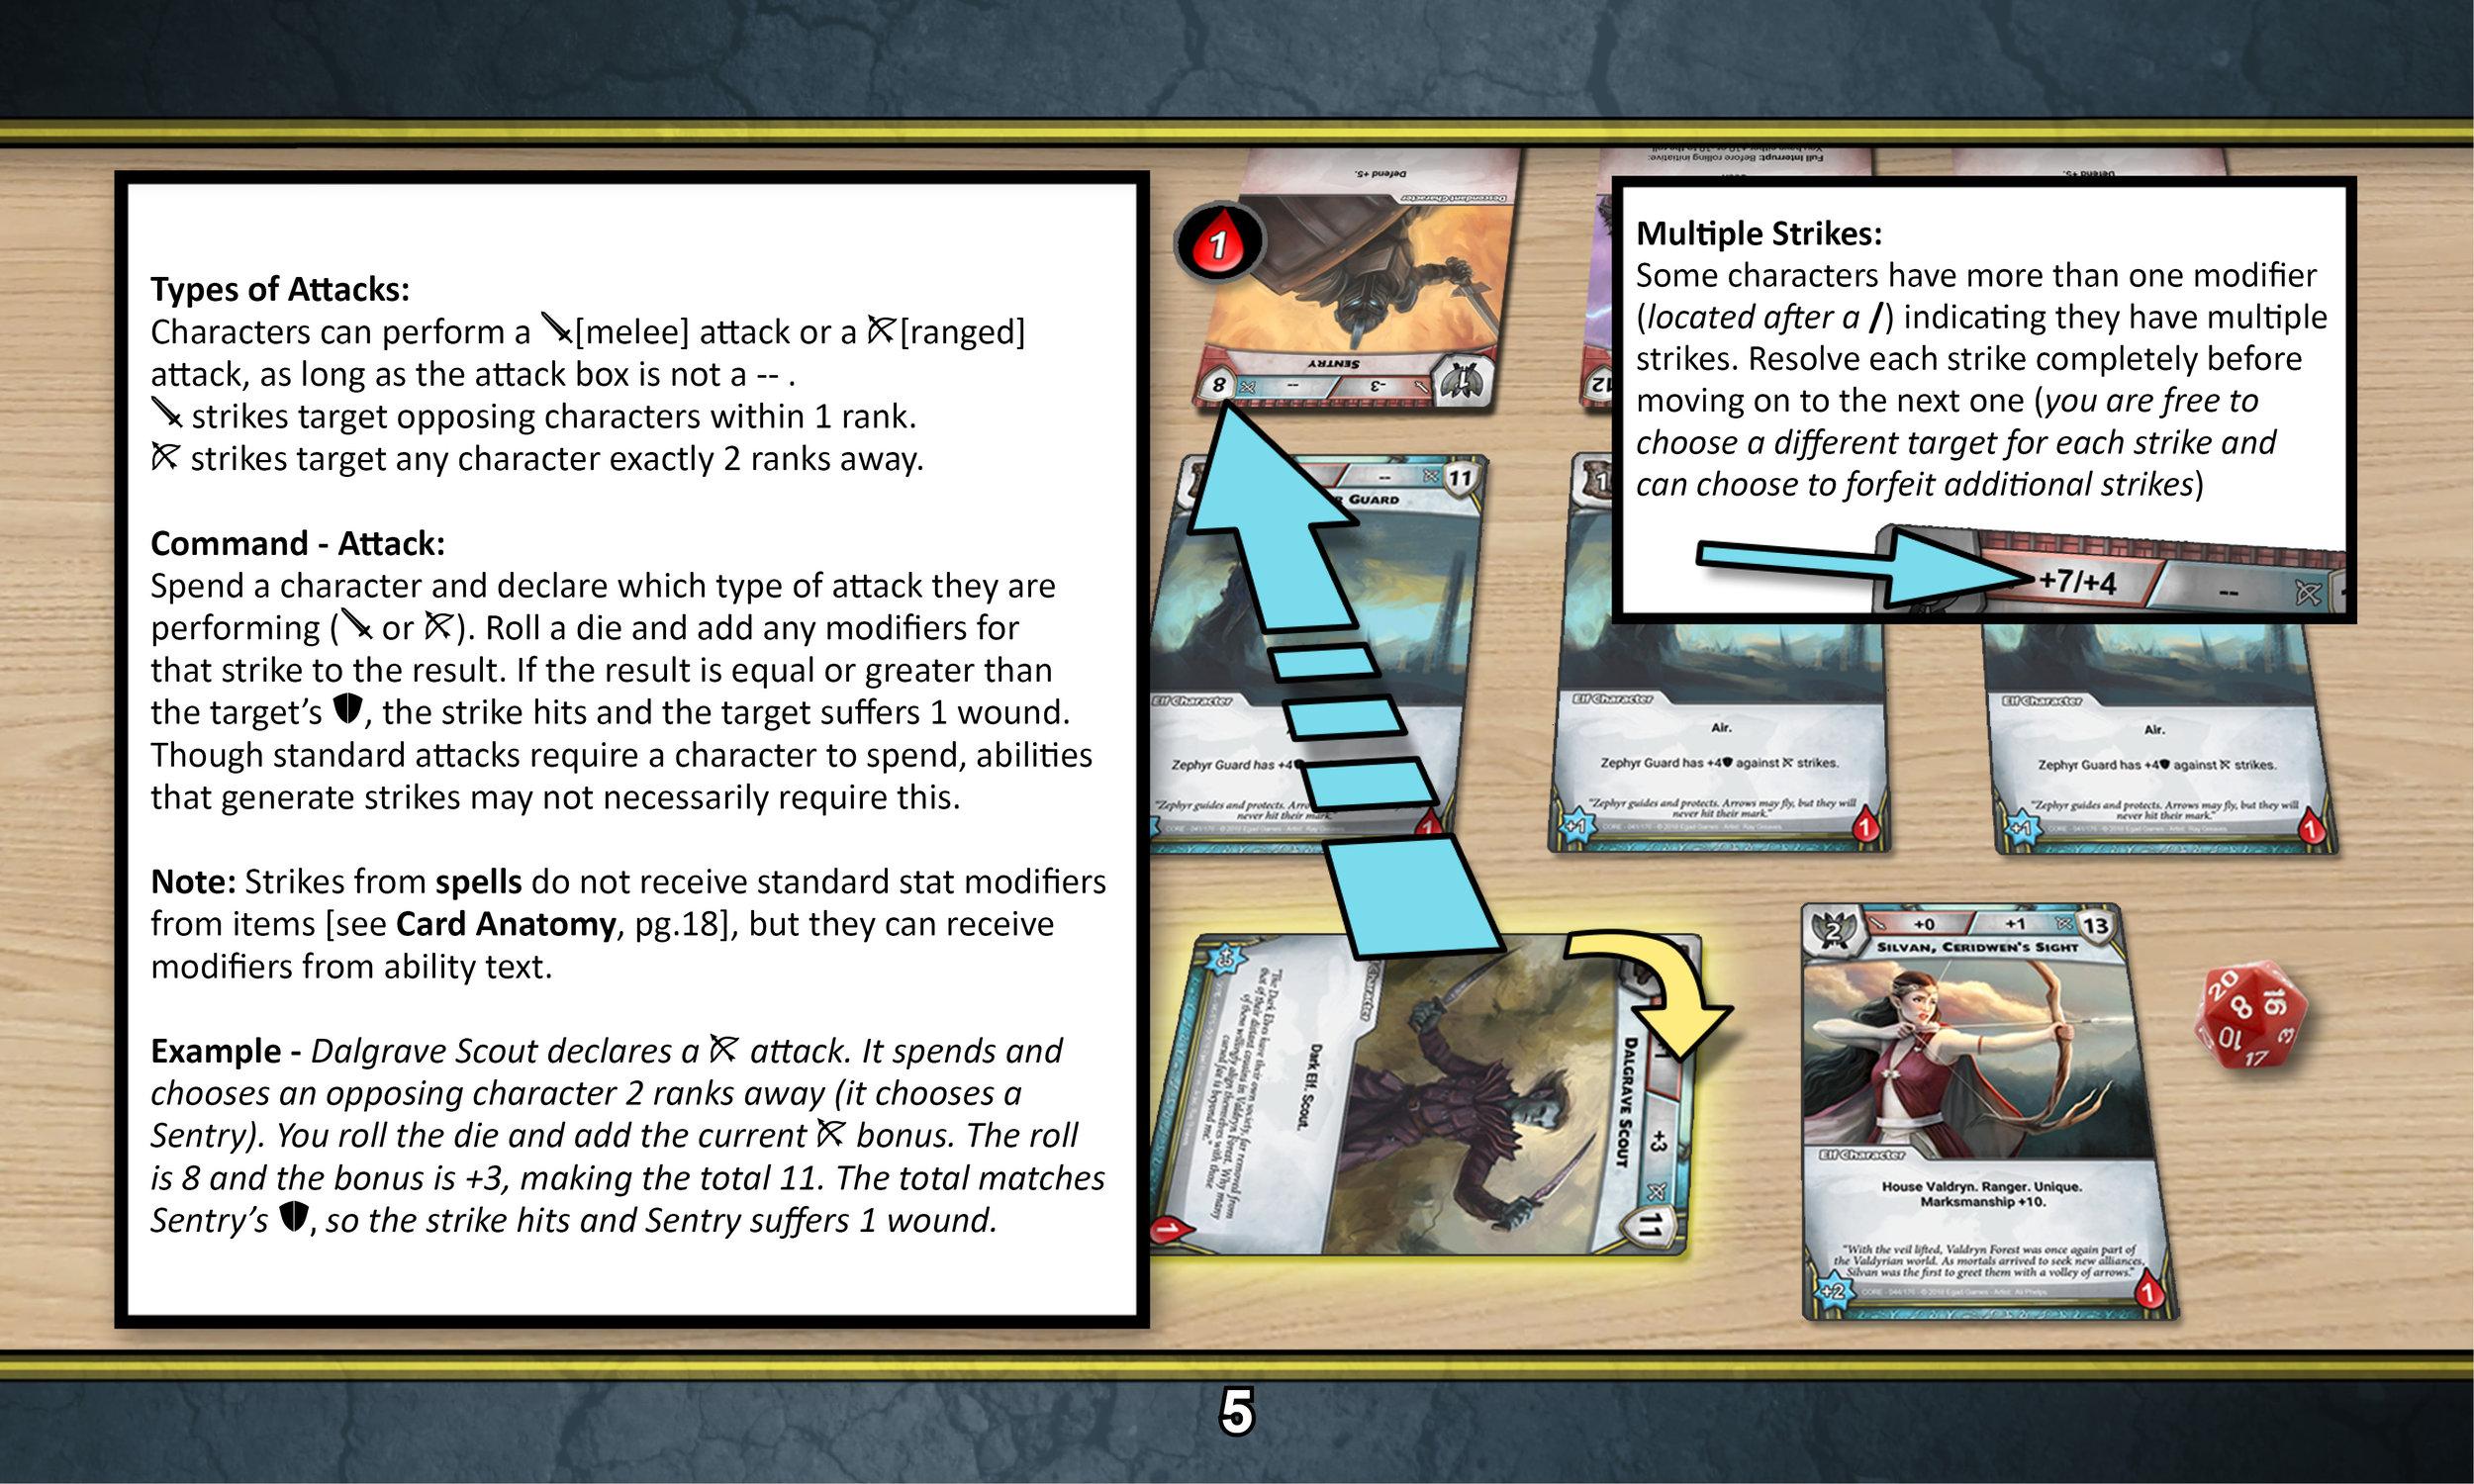 Legion_Learn_to_Play5.jpg